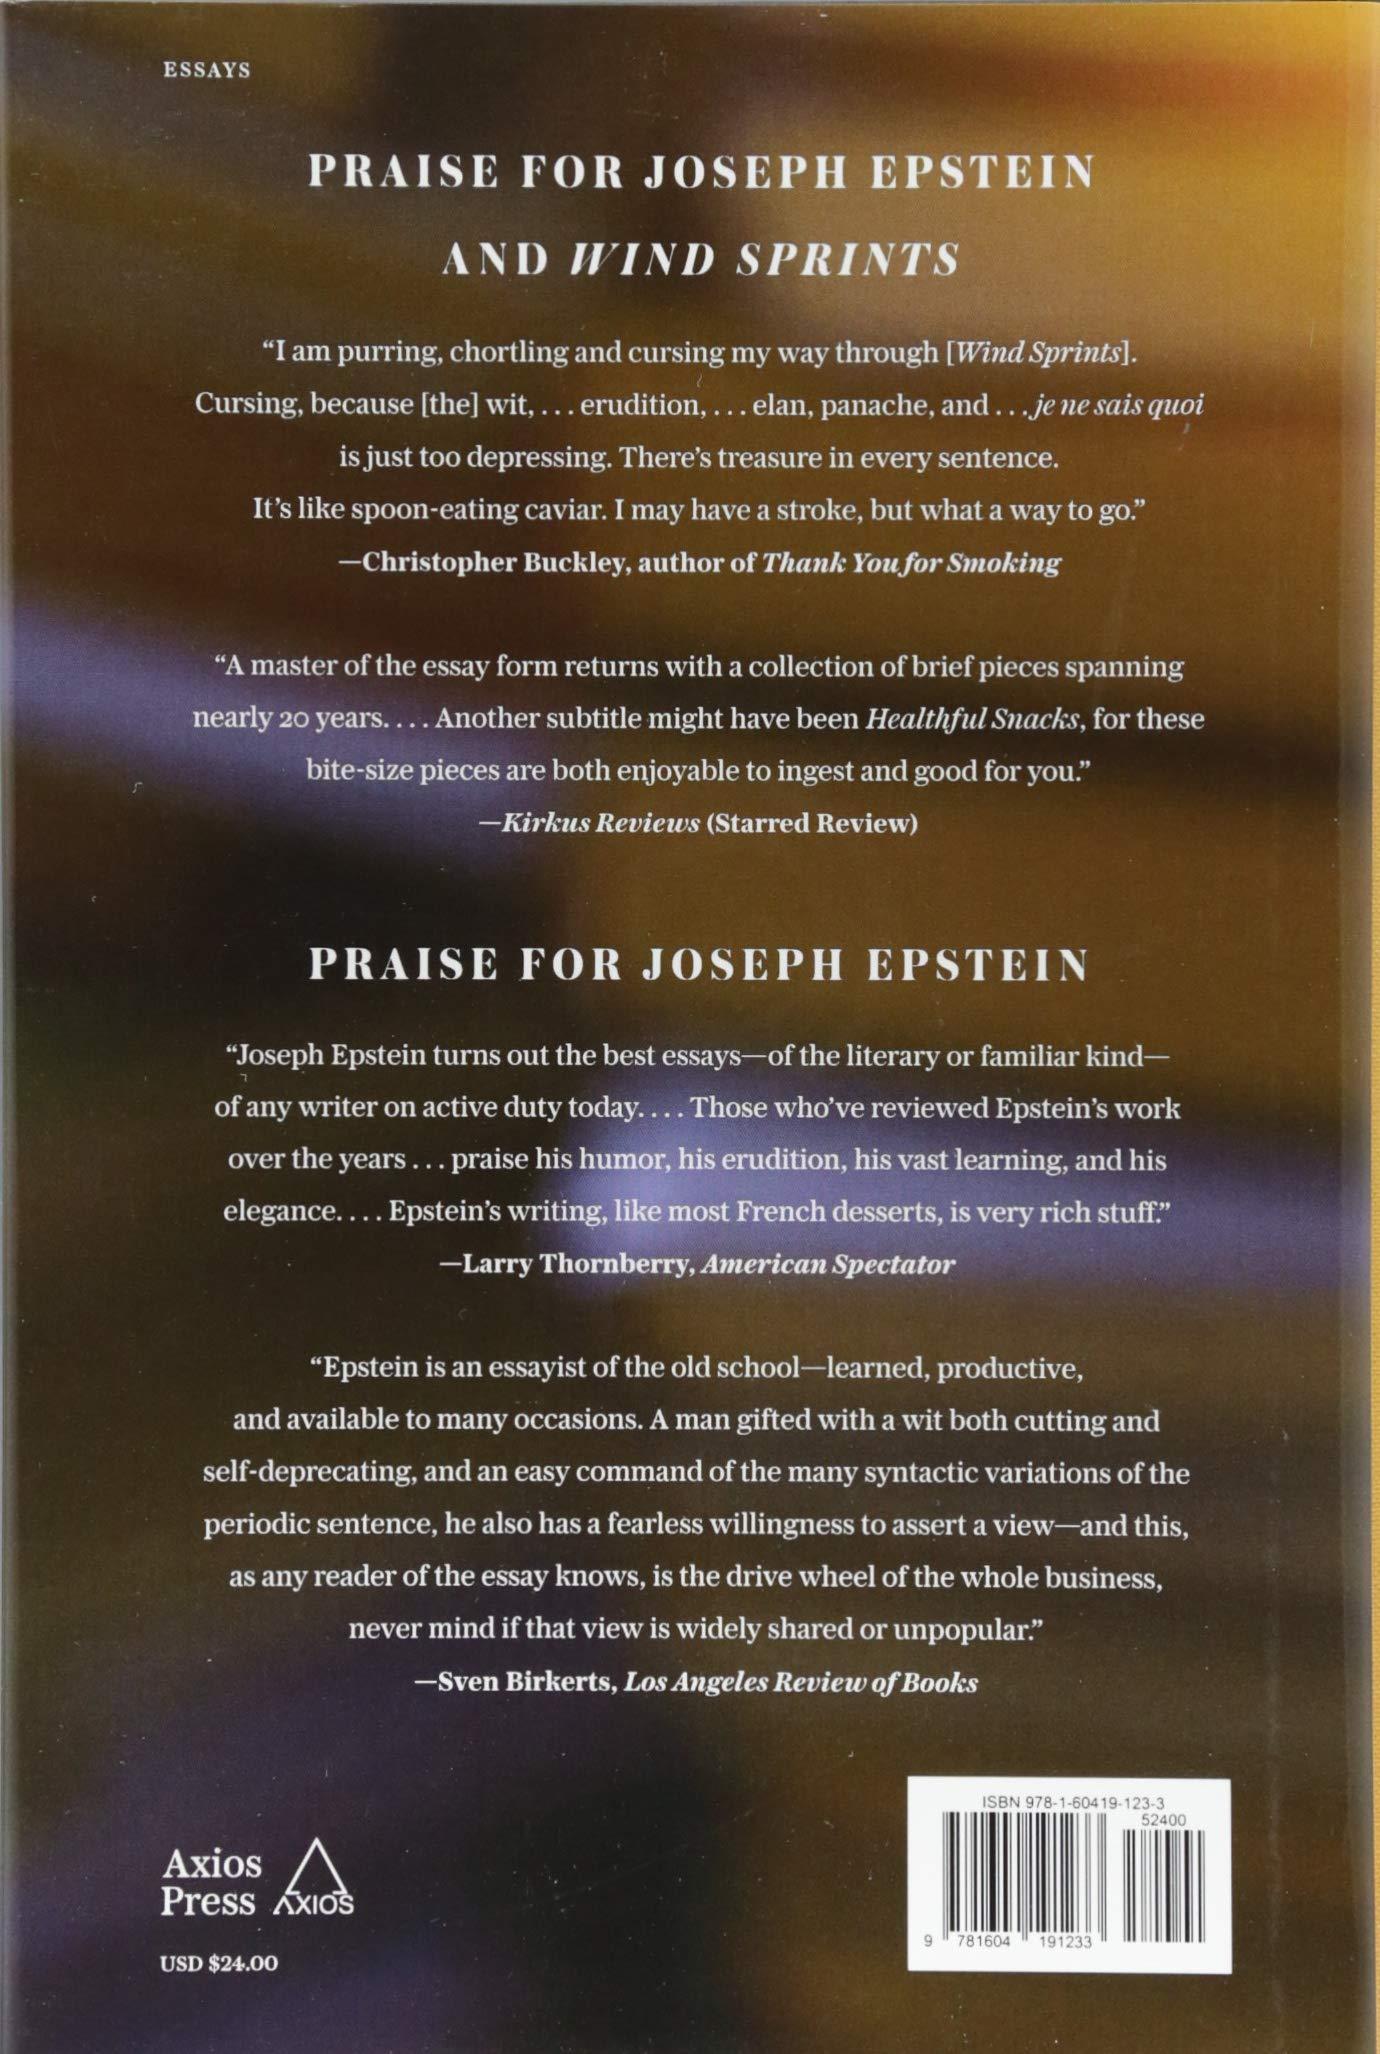 The Ideal of Culture: Essays: Joseph Epstein: 9781604191233: Amazon